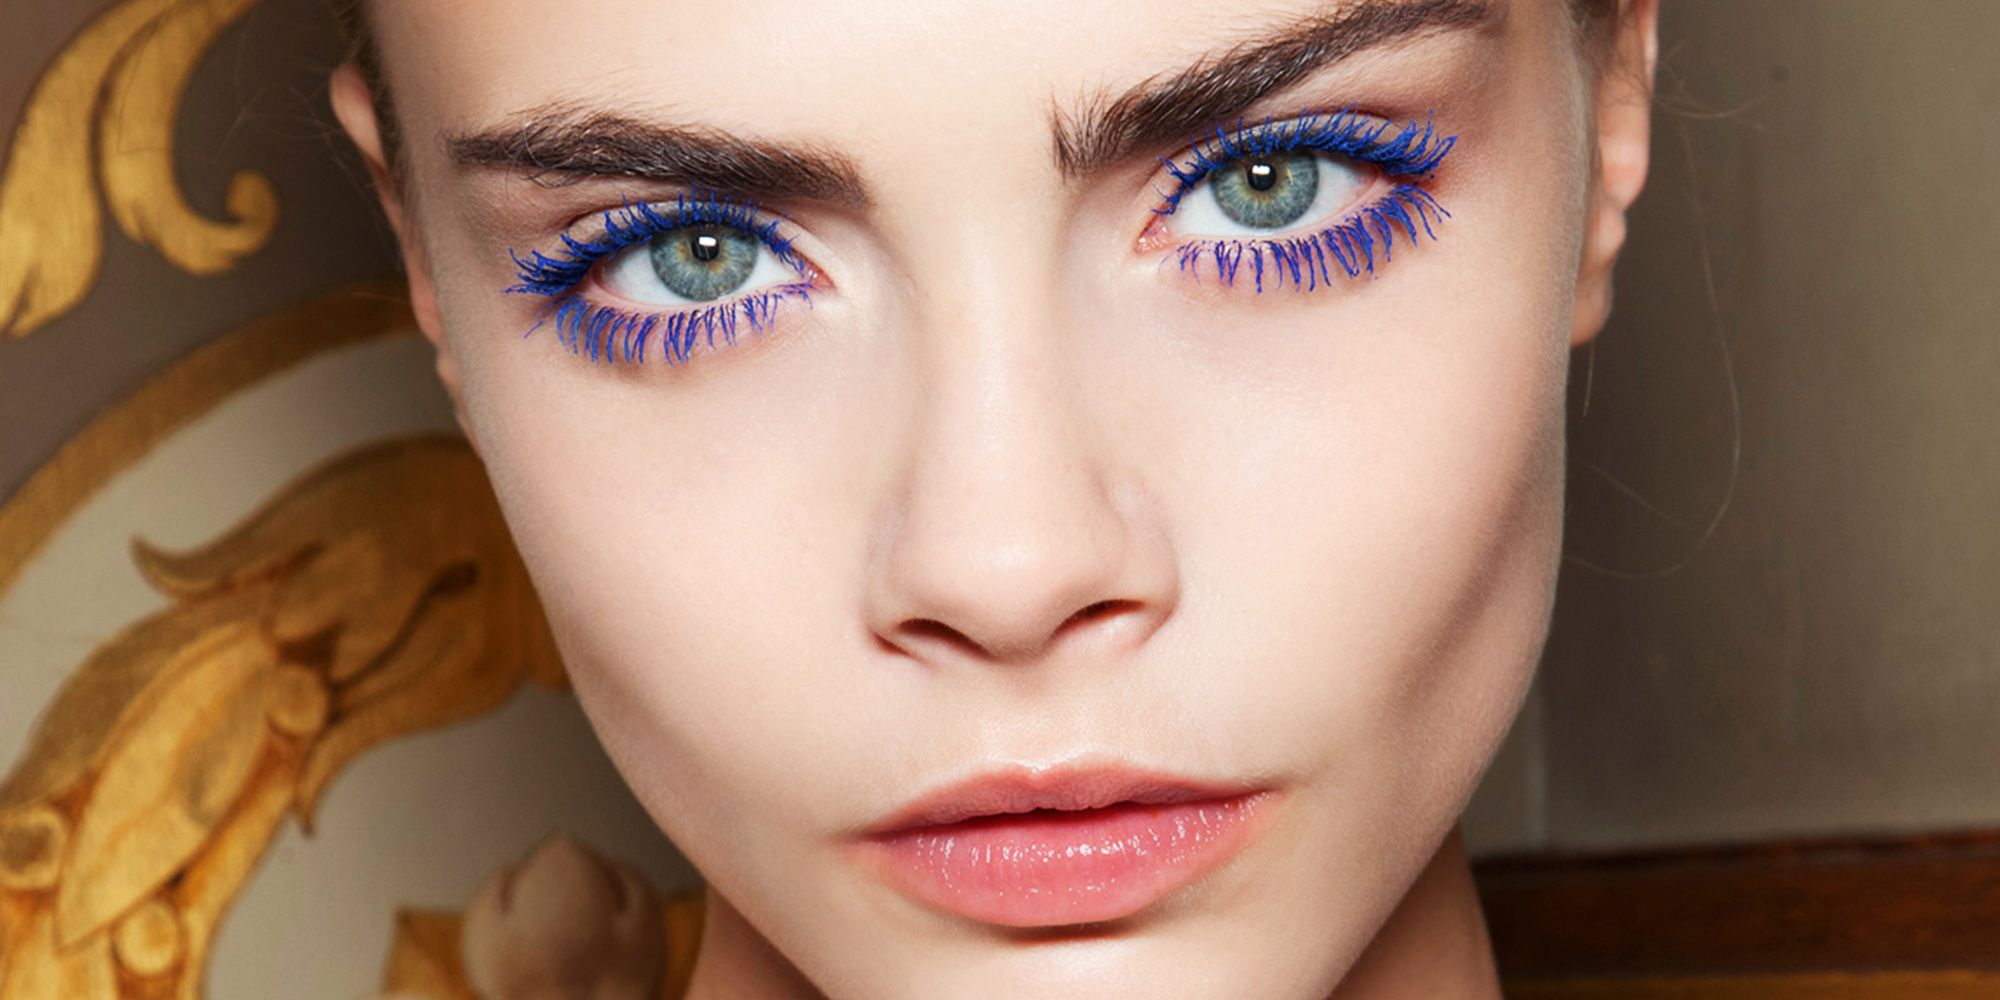 10 Best Blue Mascara Brands How To Wear Bright Blue Mascara